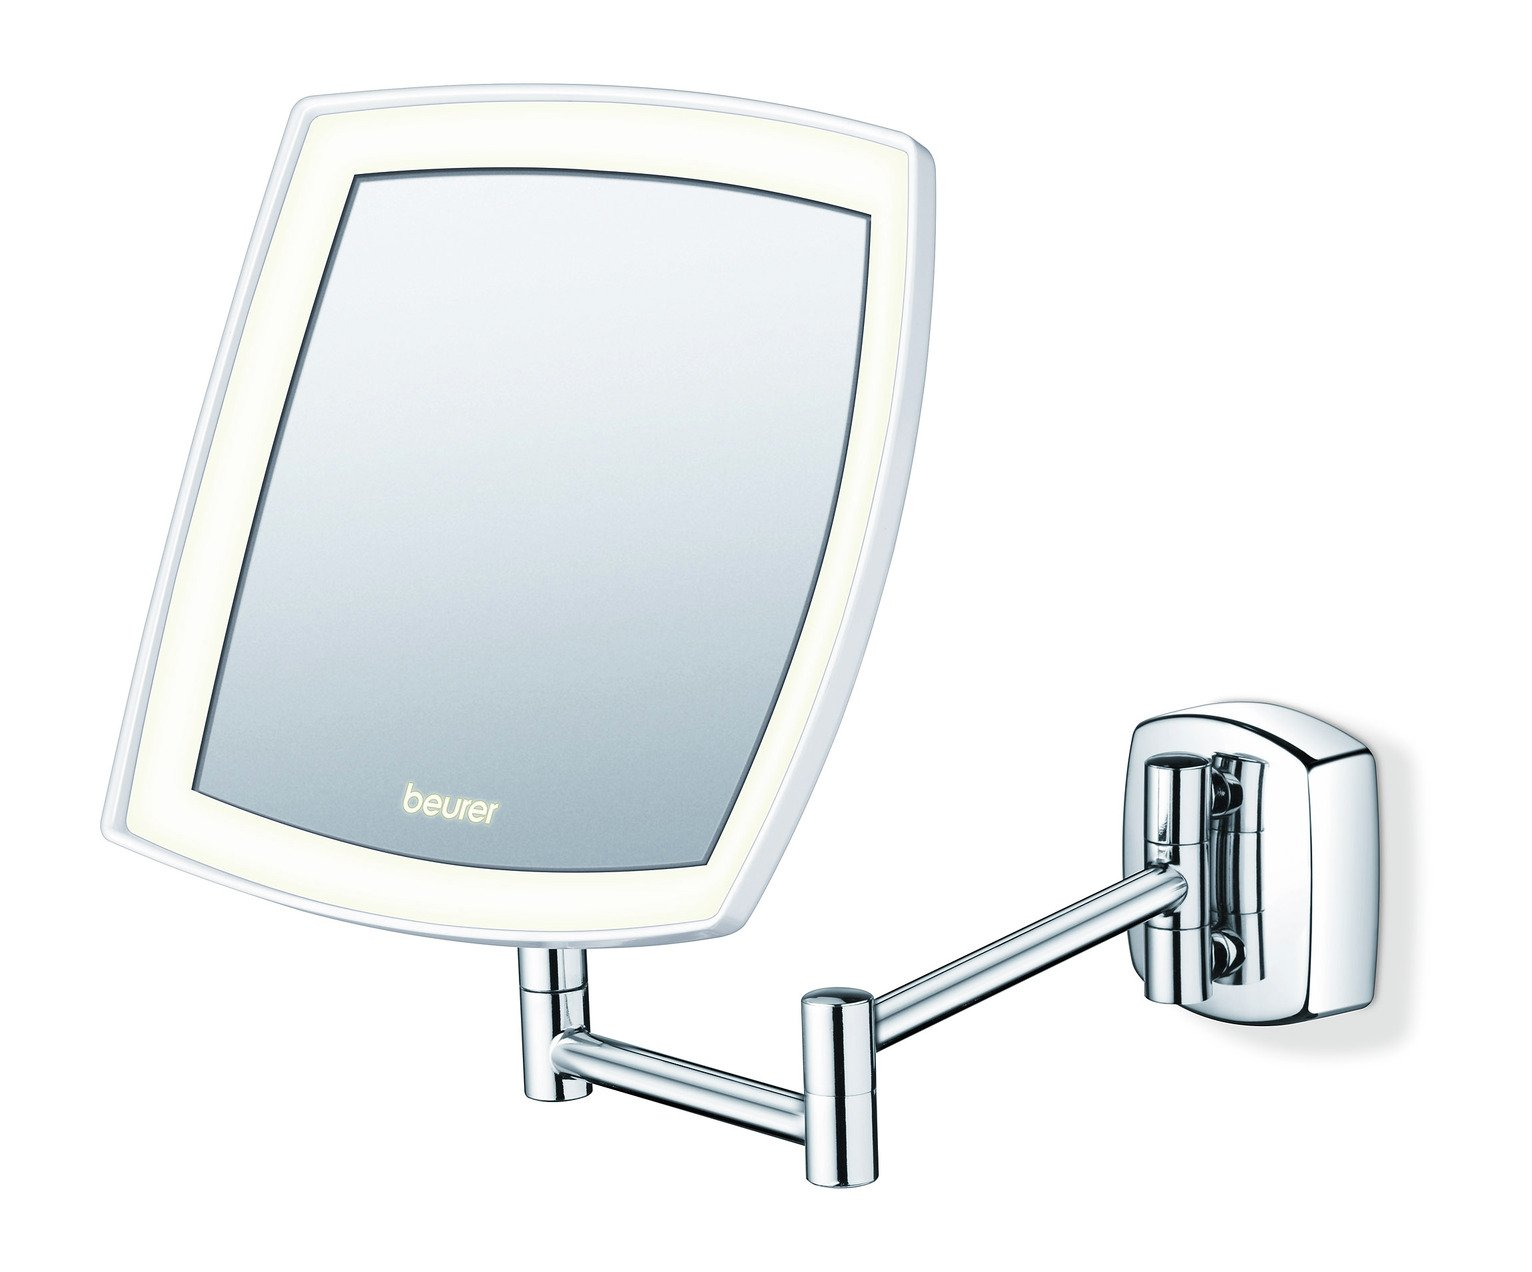 Chrome Wall Mirror buy beurer bs89 illuminated led wall mirror - chrome at argos.co